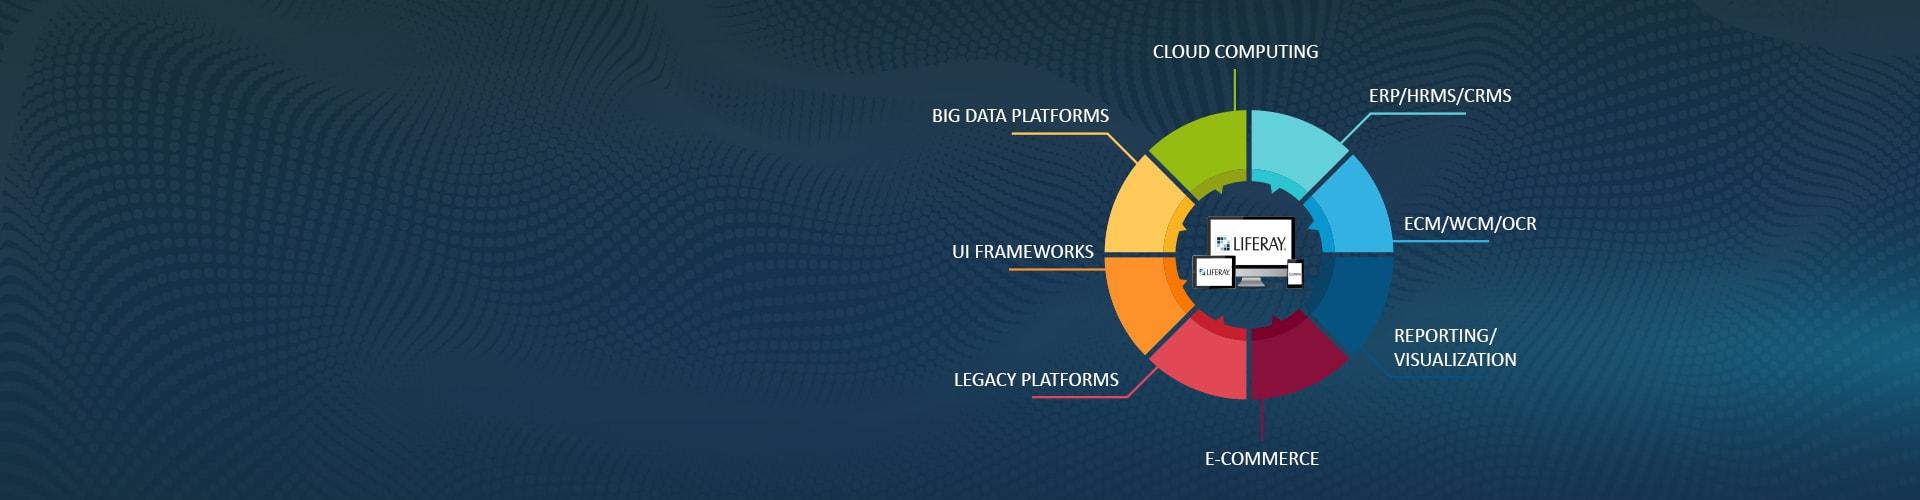 Open Source Portals, ECM, eCommerce, Big Data Analytics